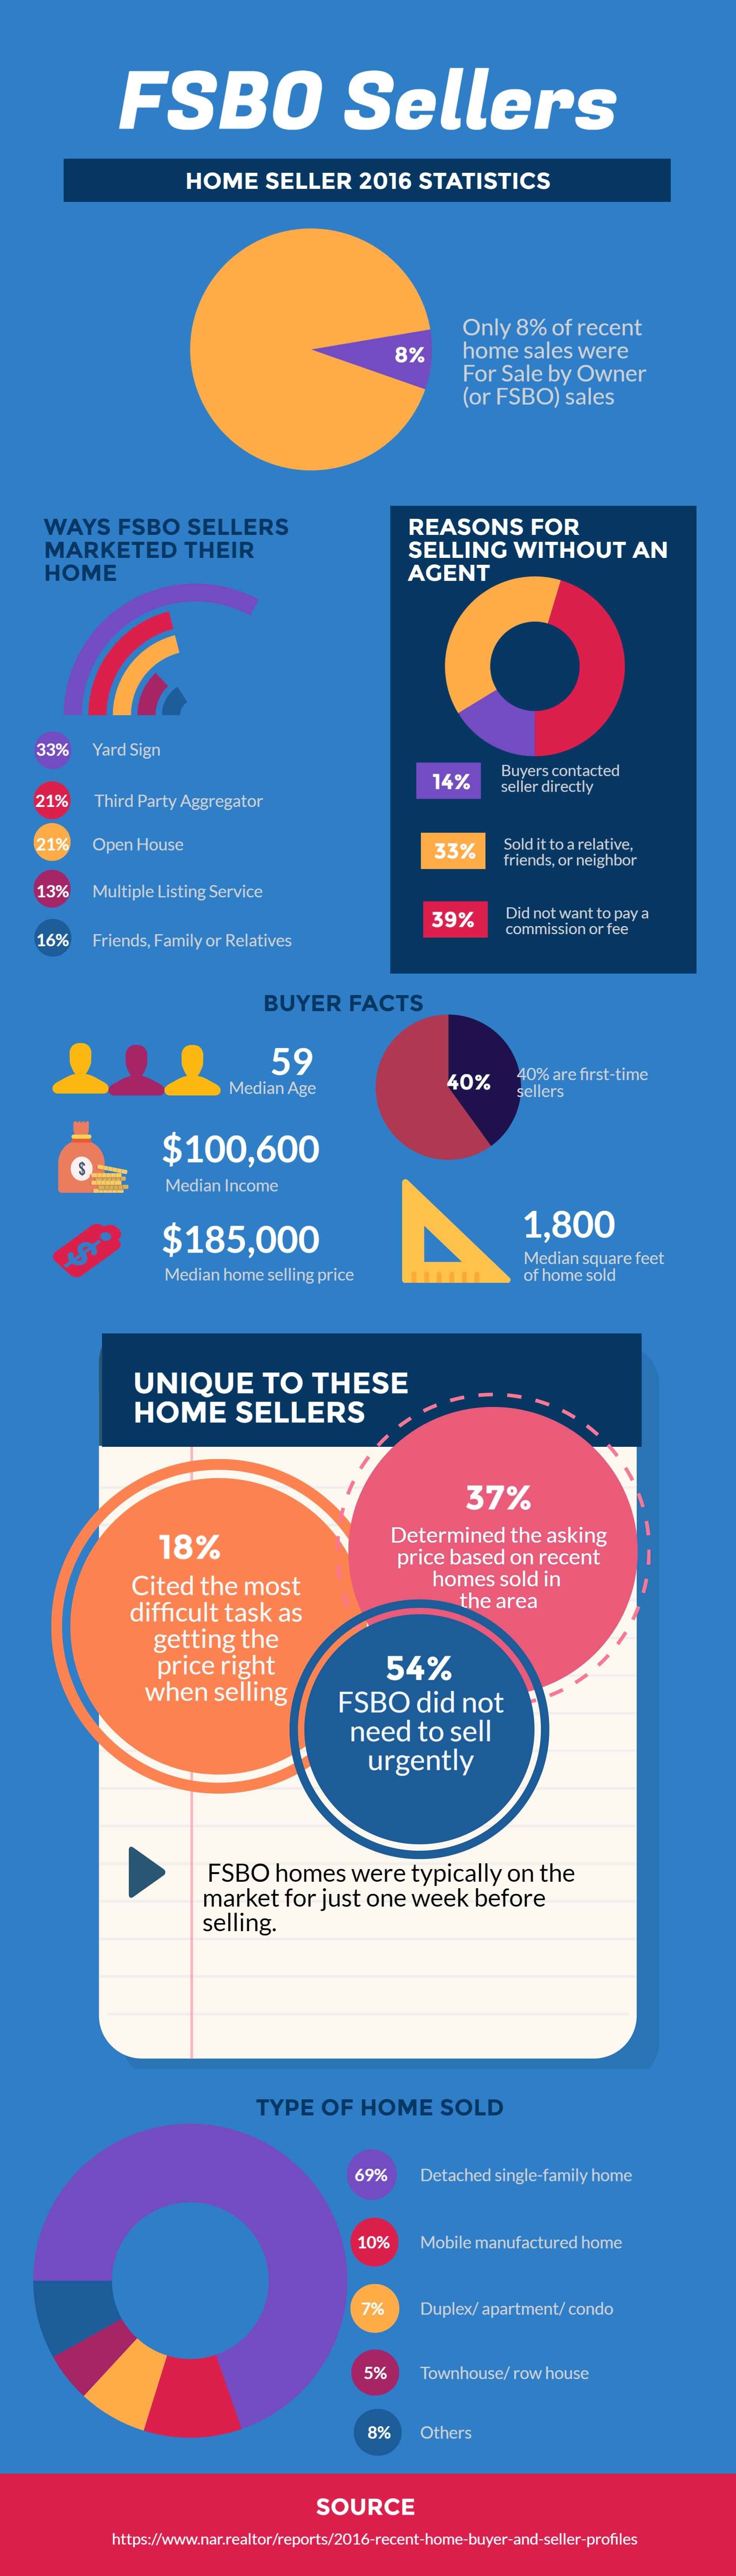 fsbo-sellers-statistic